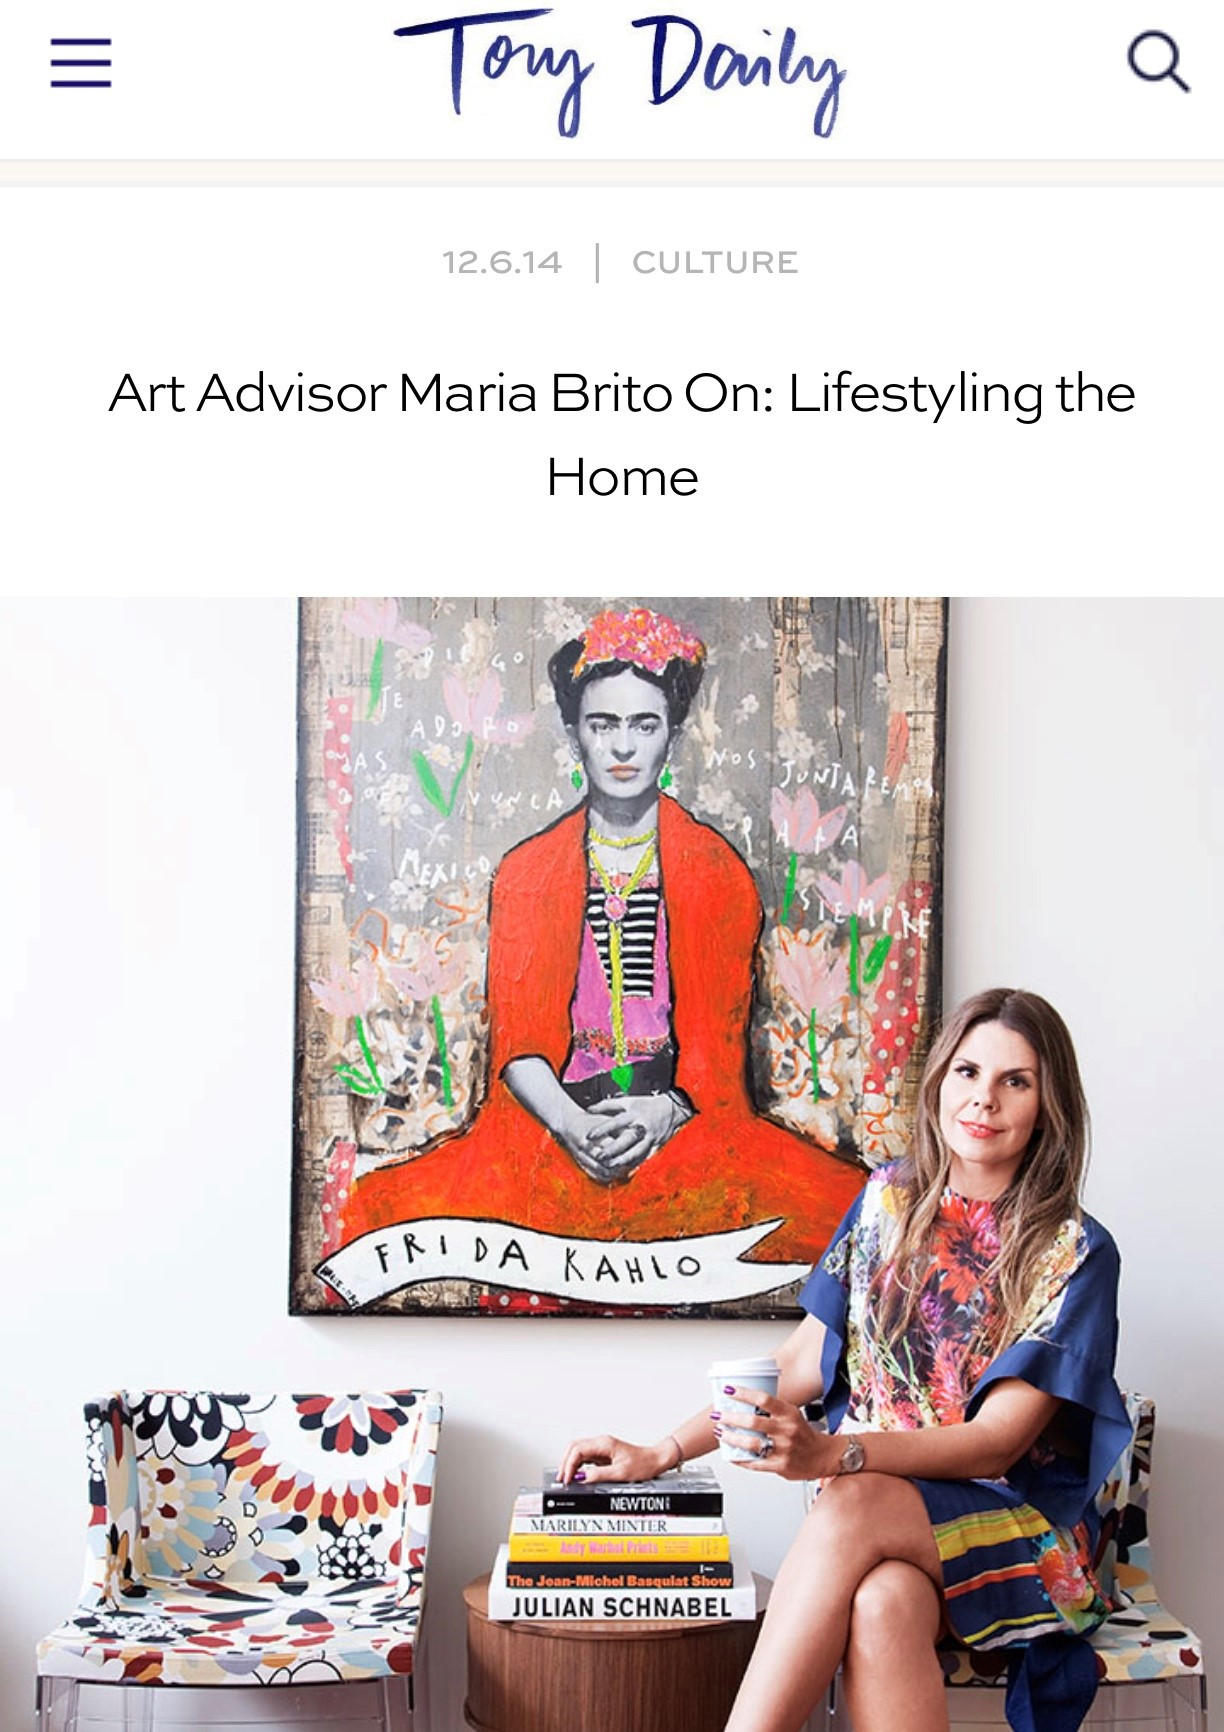 Maria-Brito_Tory-Burch.jpg